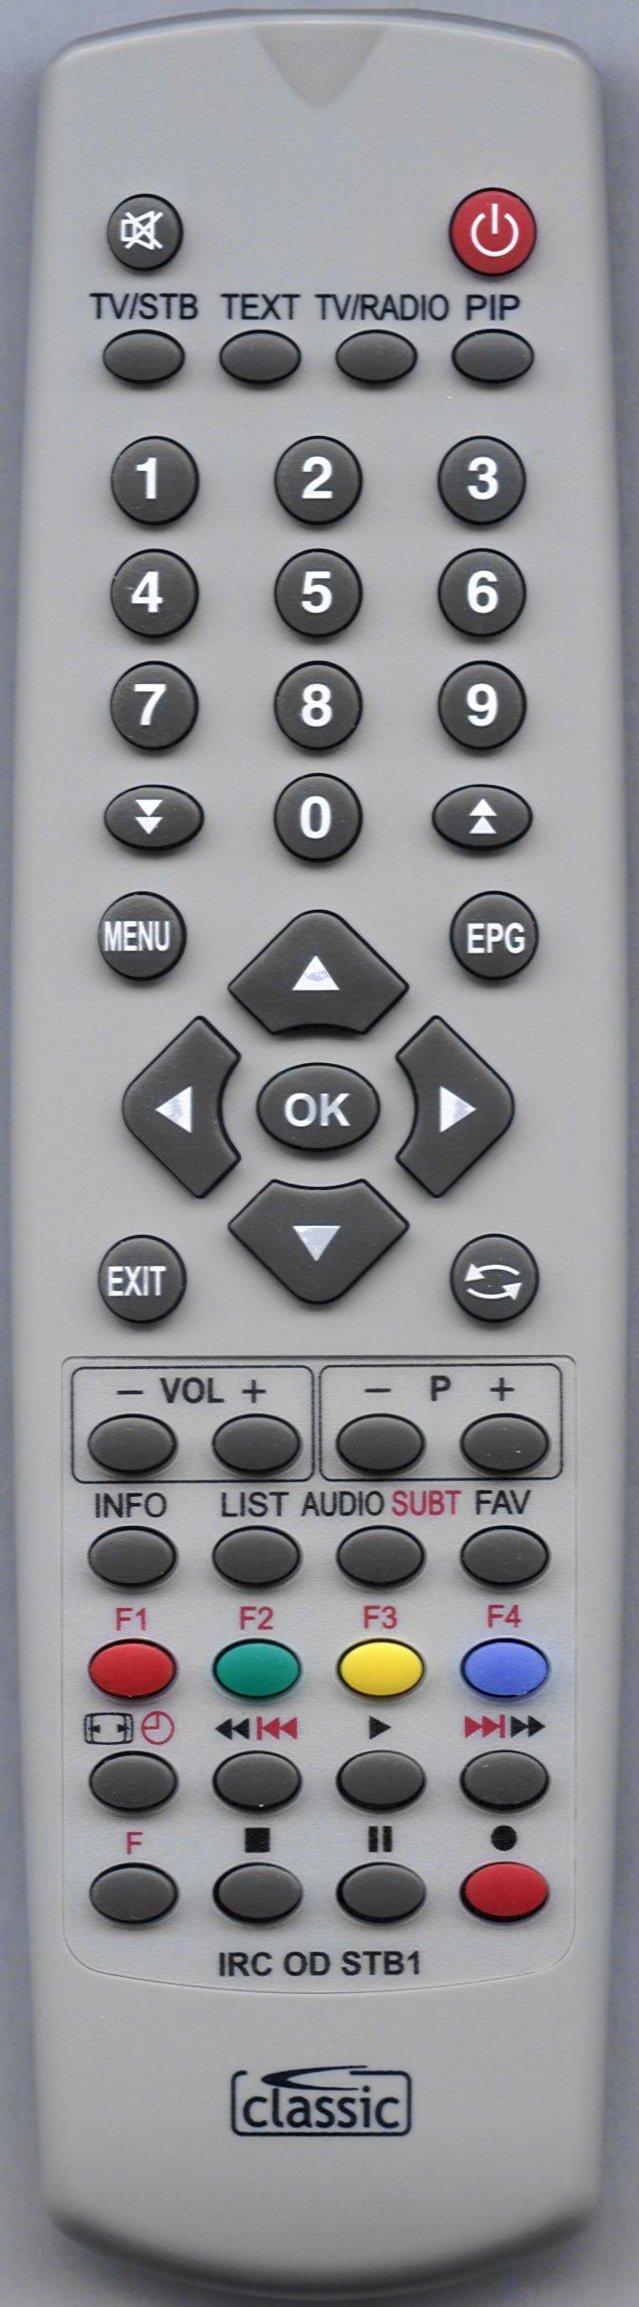 TOPFIELD TF 5000PVR Remote Control Alternative